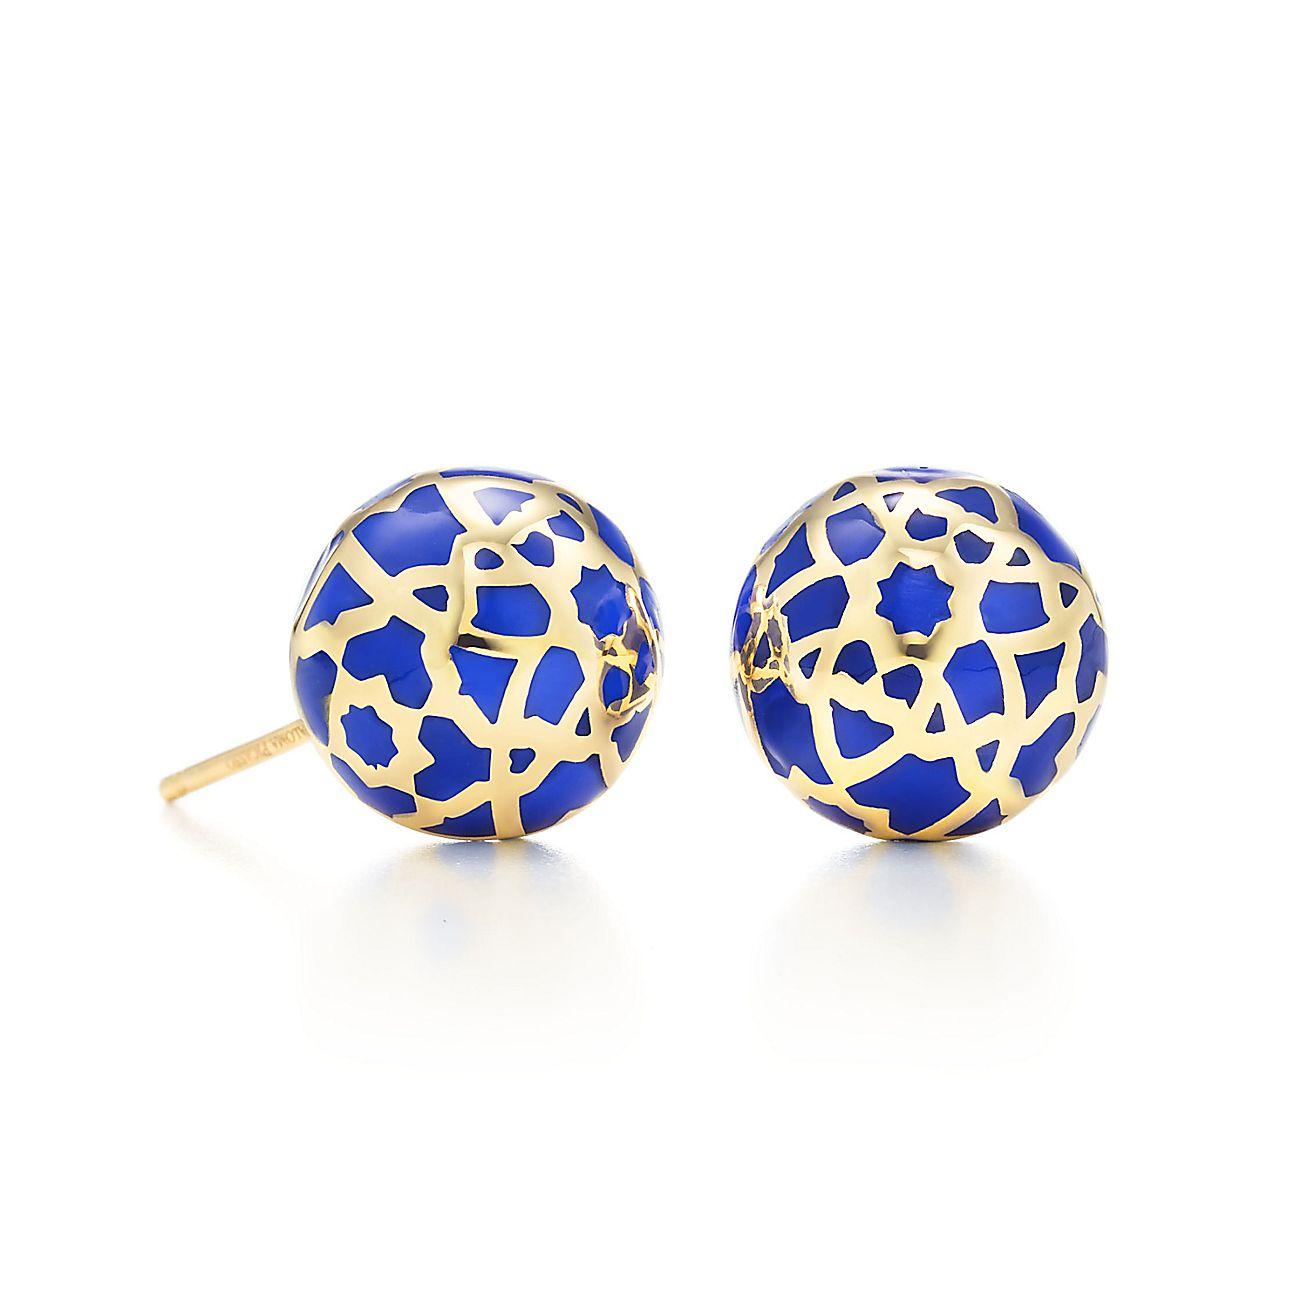 Paloma's Marrakesh:Earrings